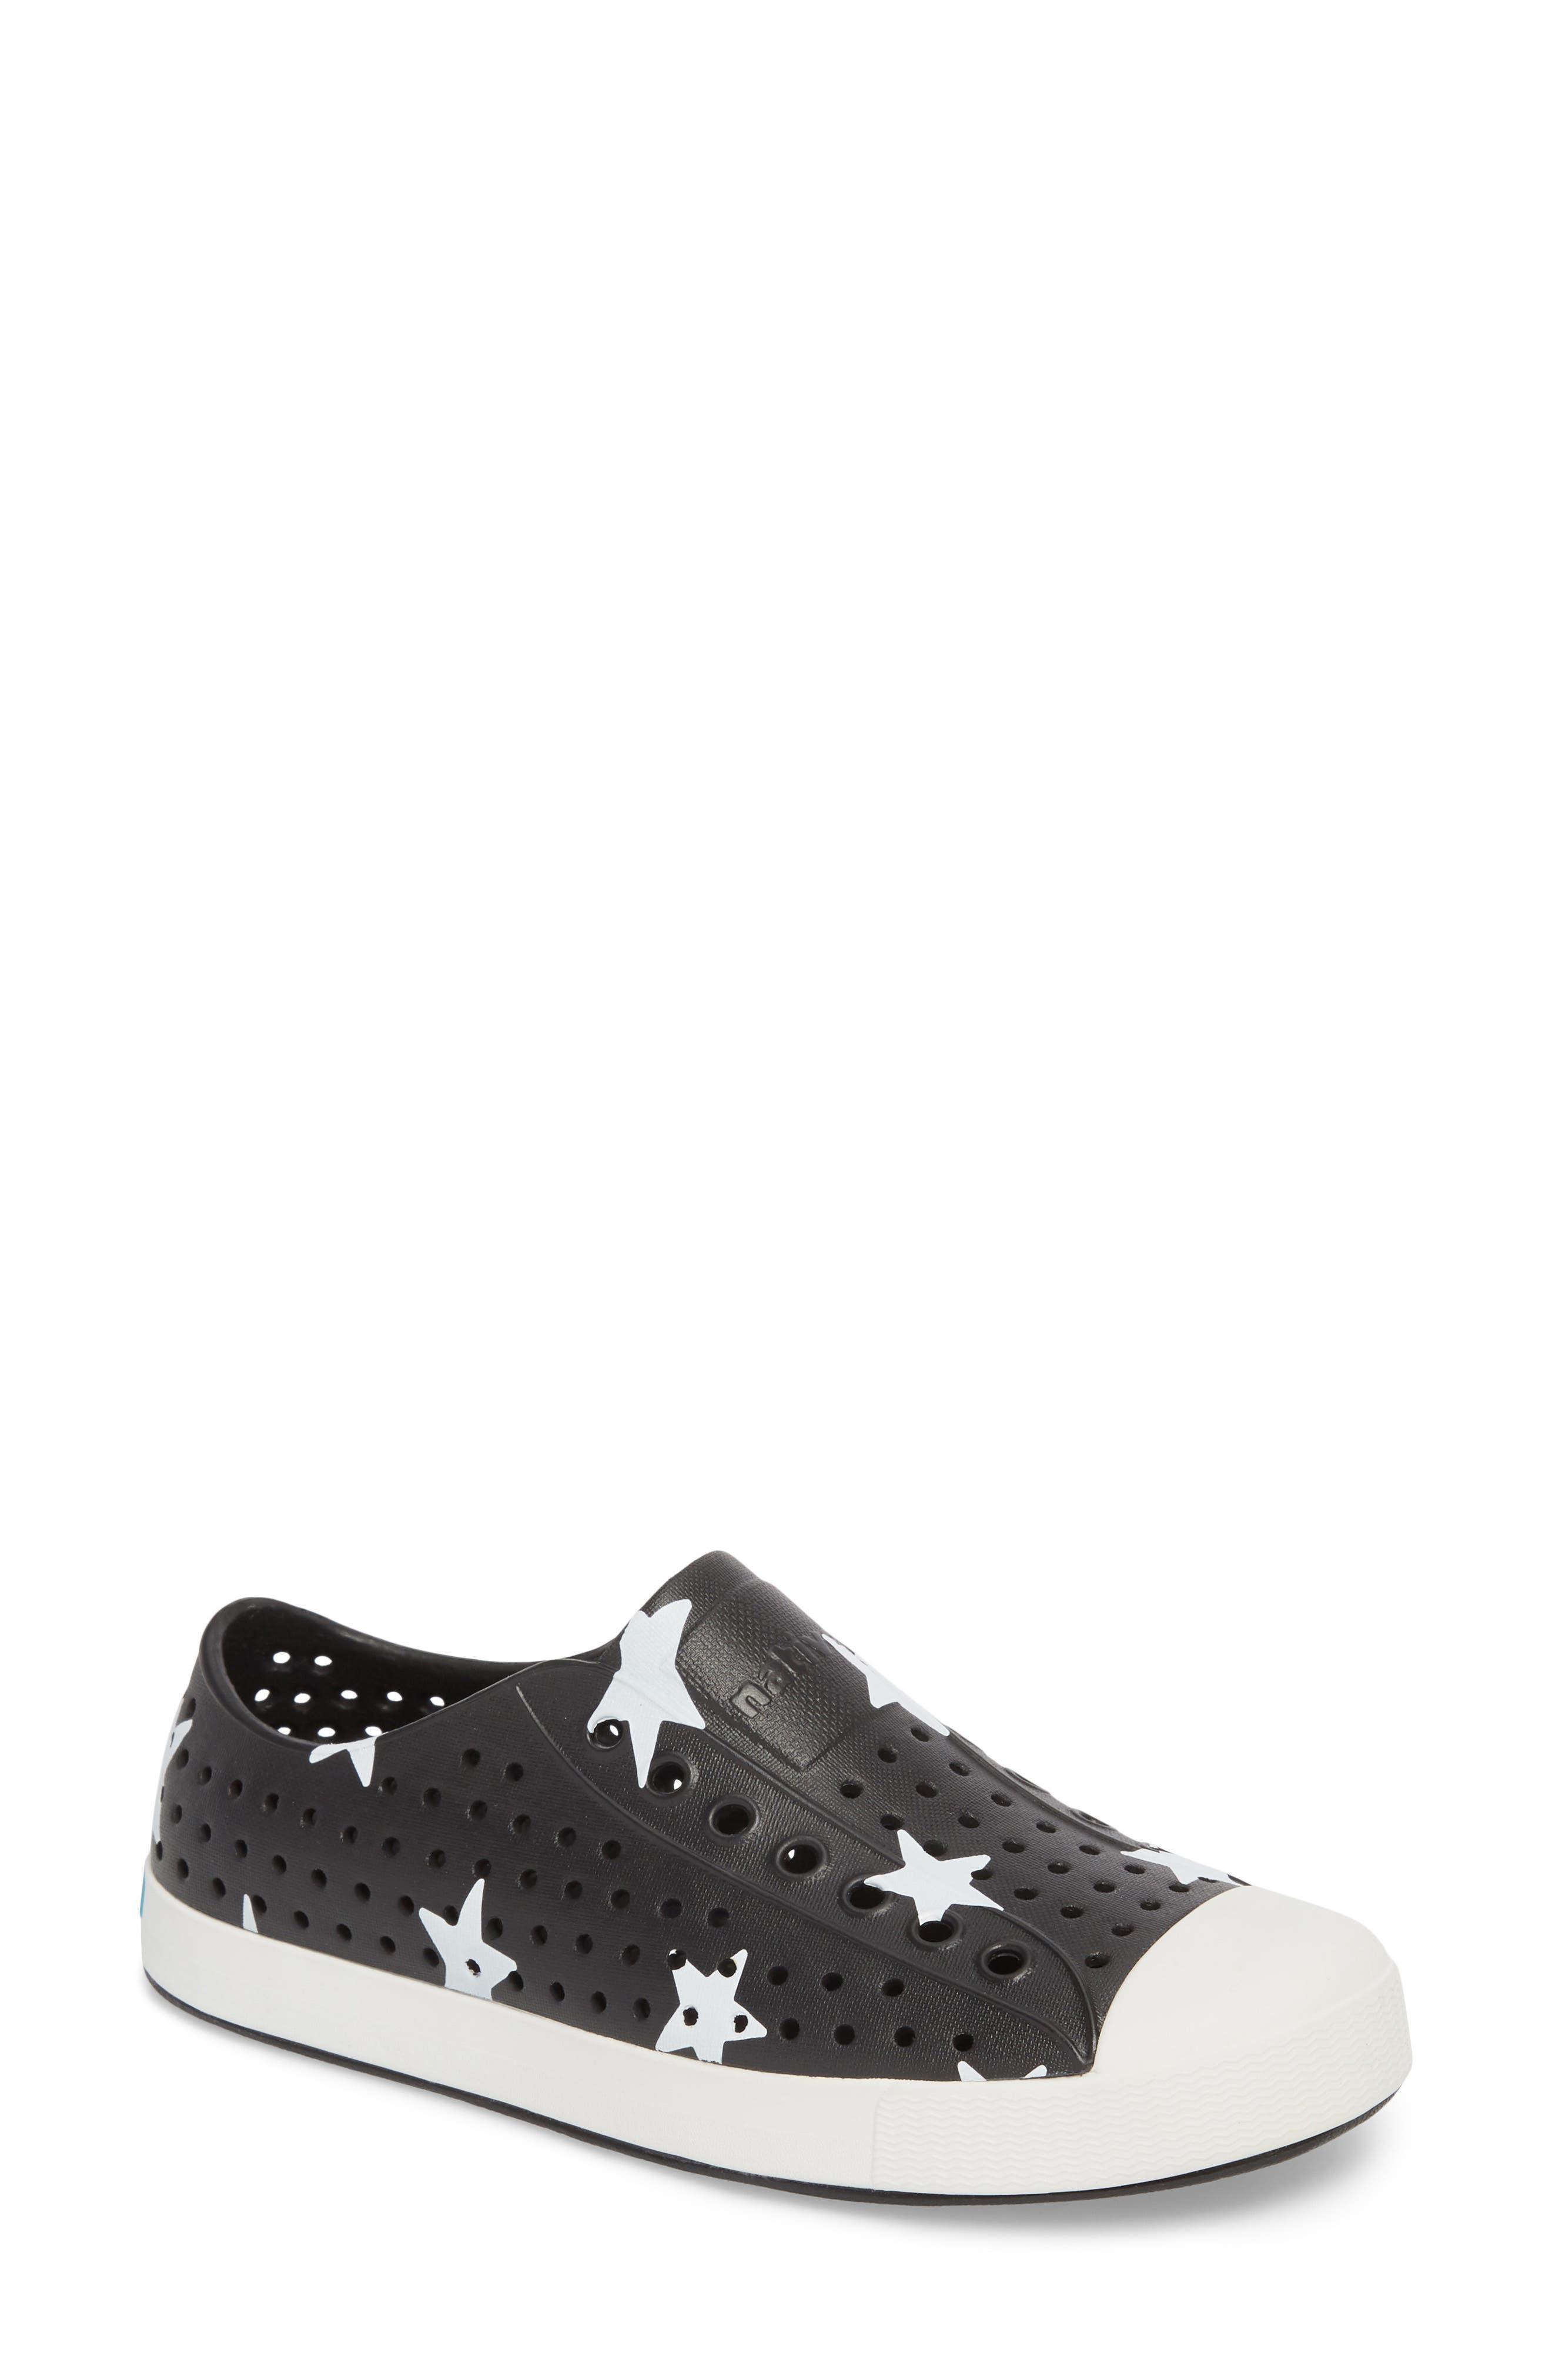 'Jefferson' Printed Slip-On Sneaker,                         Main,                         color, Jiffy Black/ White/ Big Star